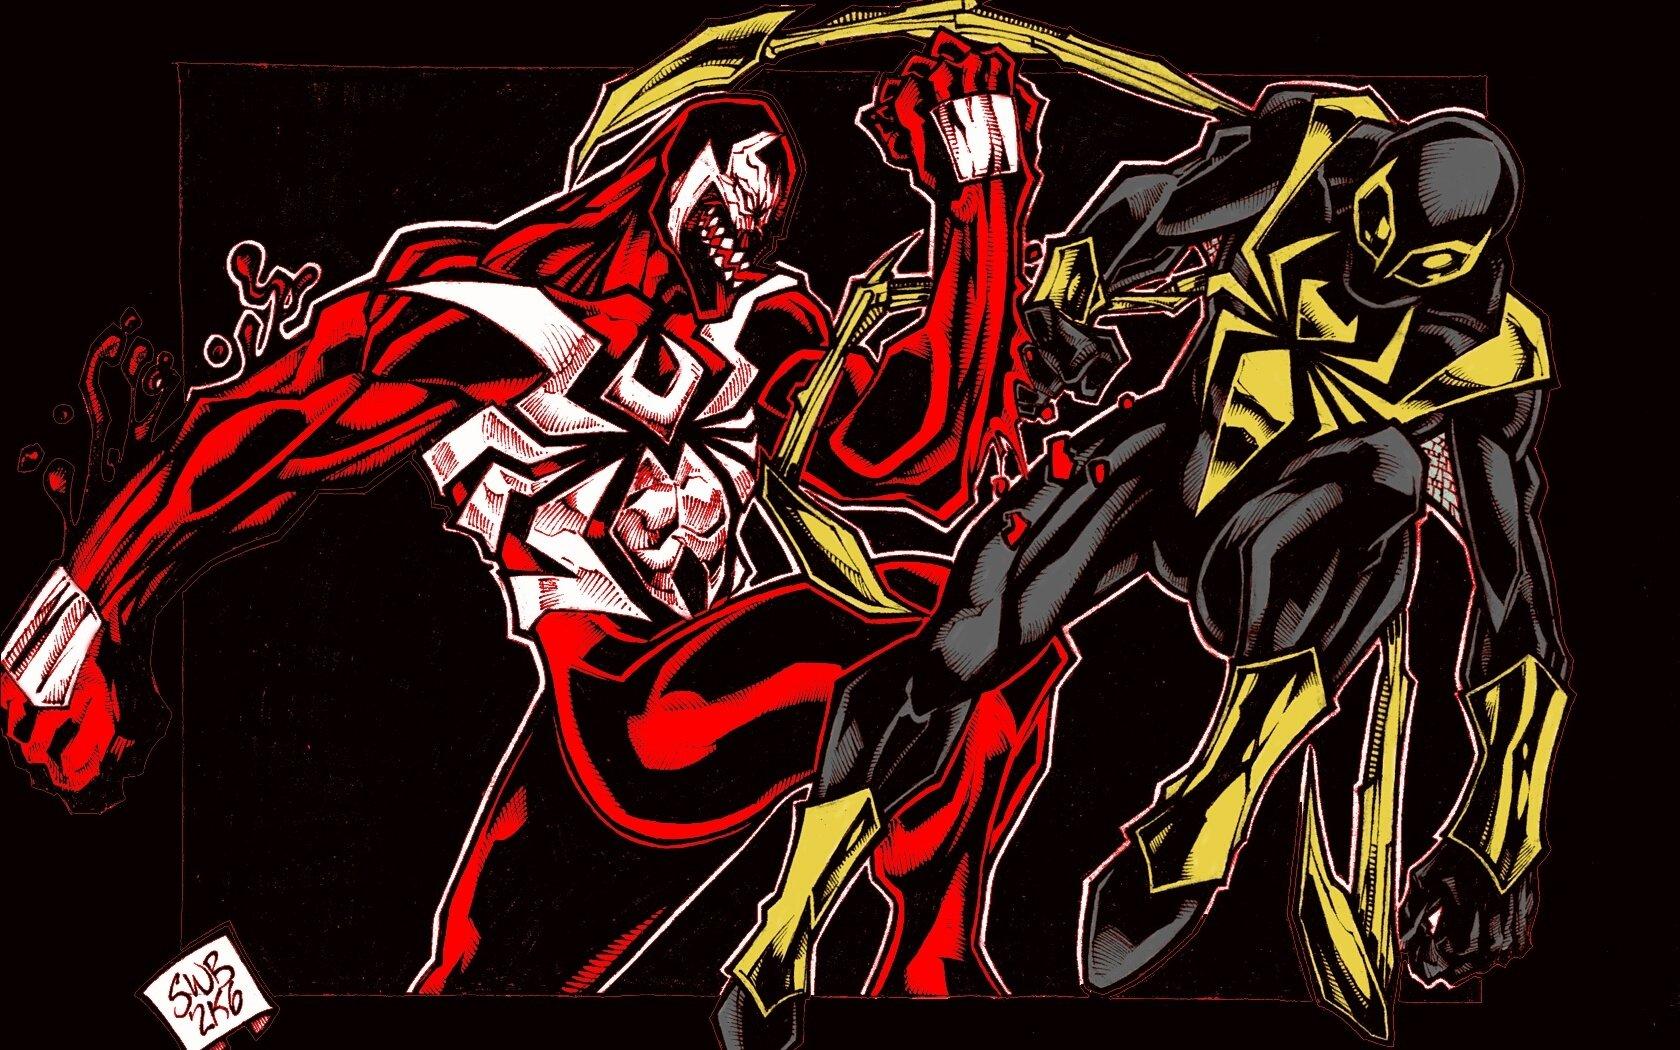 Комиксы - Человек-Паук  Веном Обои